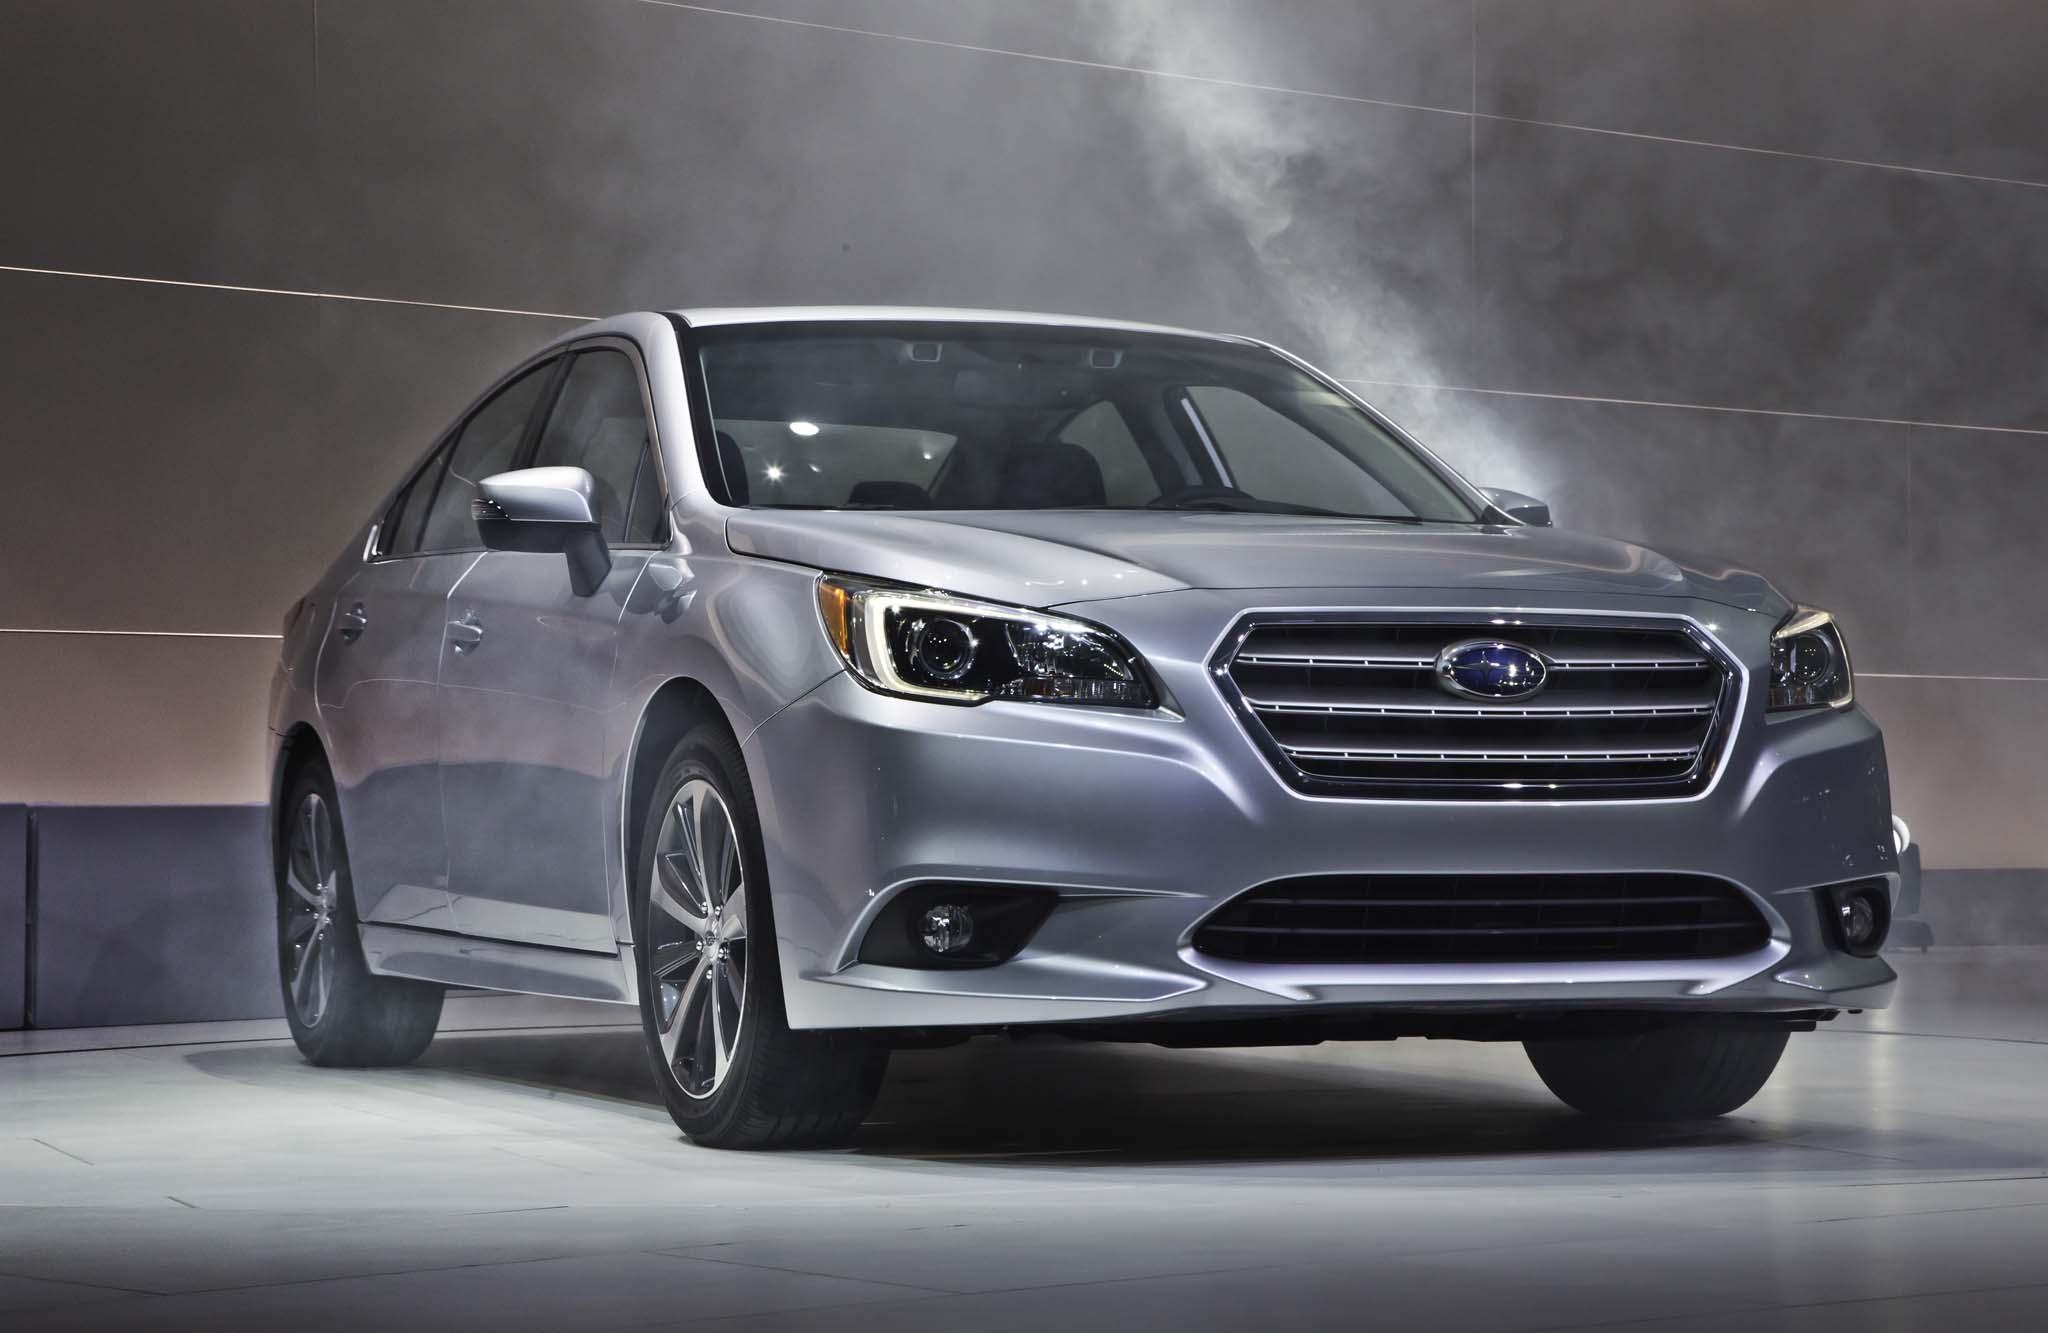 2015 Subaru Legacy Front End Design